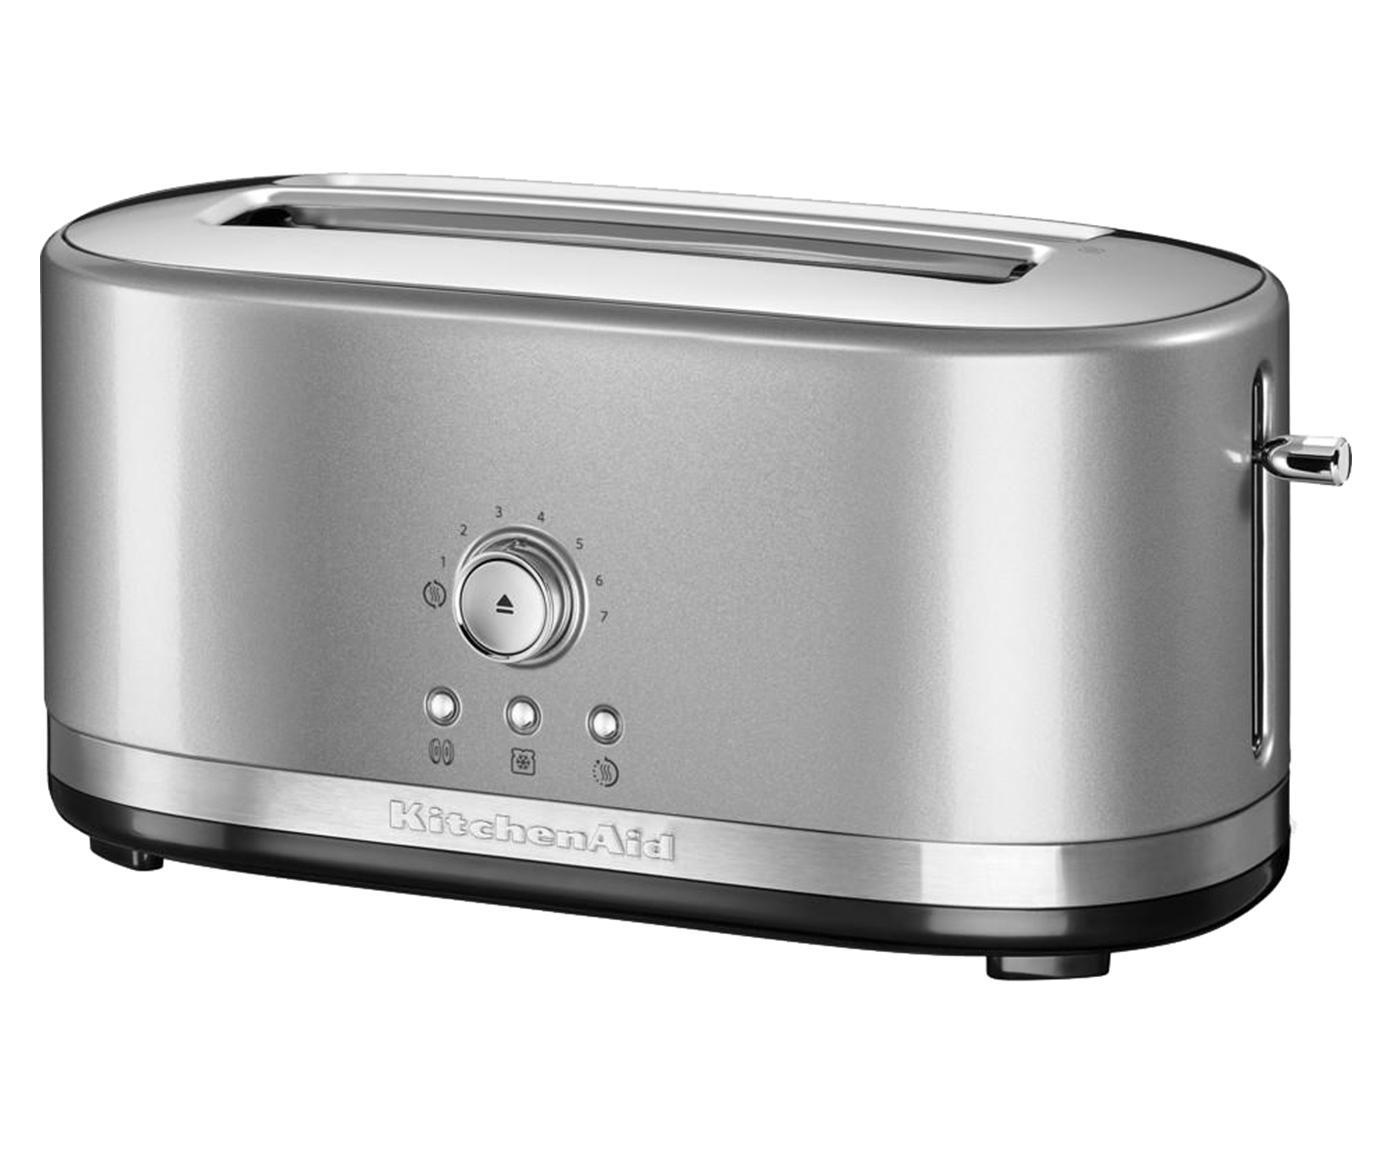 Langschlitz-Toaster KitchenAid, Gehäuse: Aluminiumdruckguss, Edels, Silbergrau, 42 x 20 cm